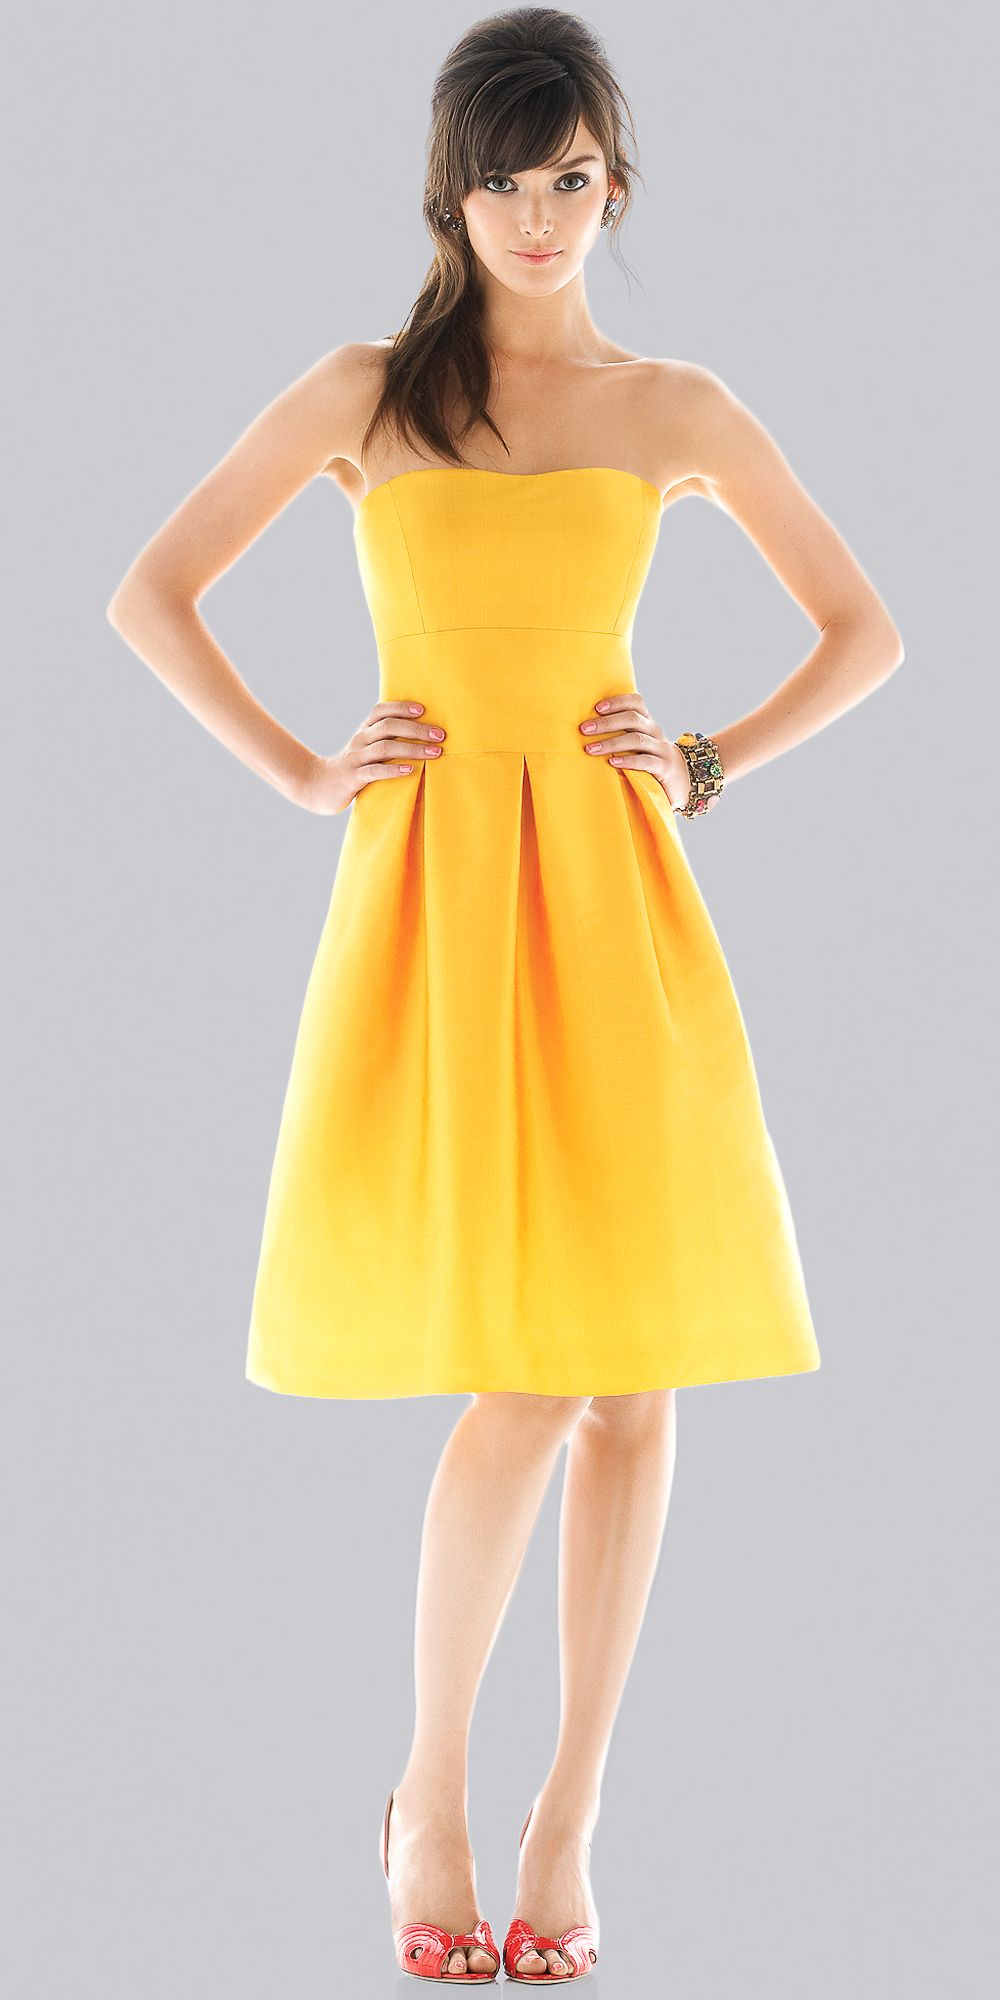 Bright yellow dress ll cool j wedding pinterest yellow dress